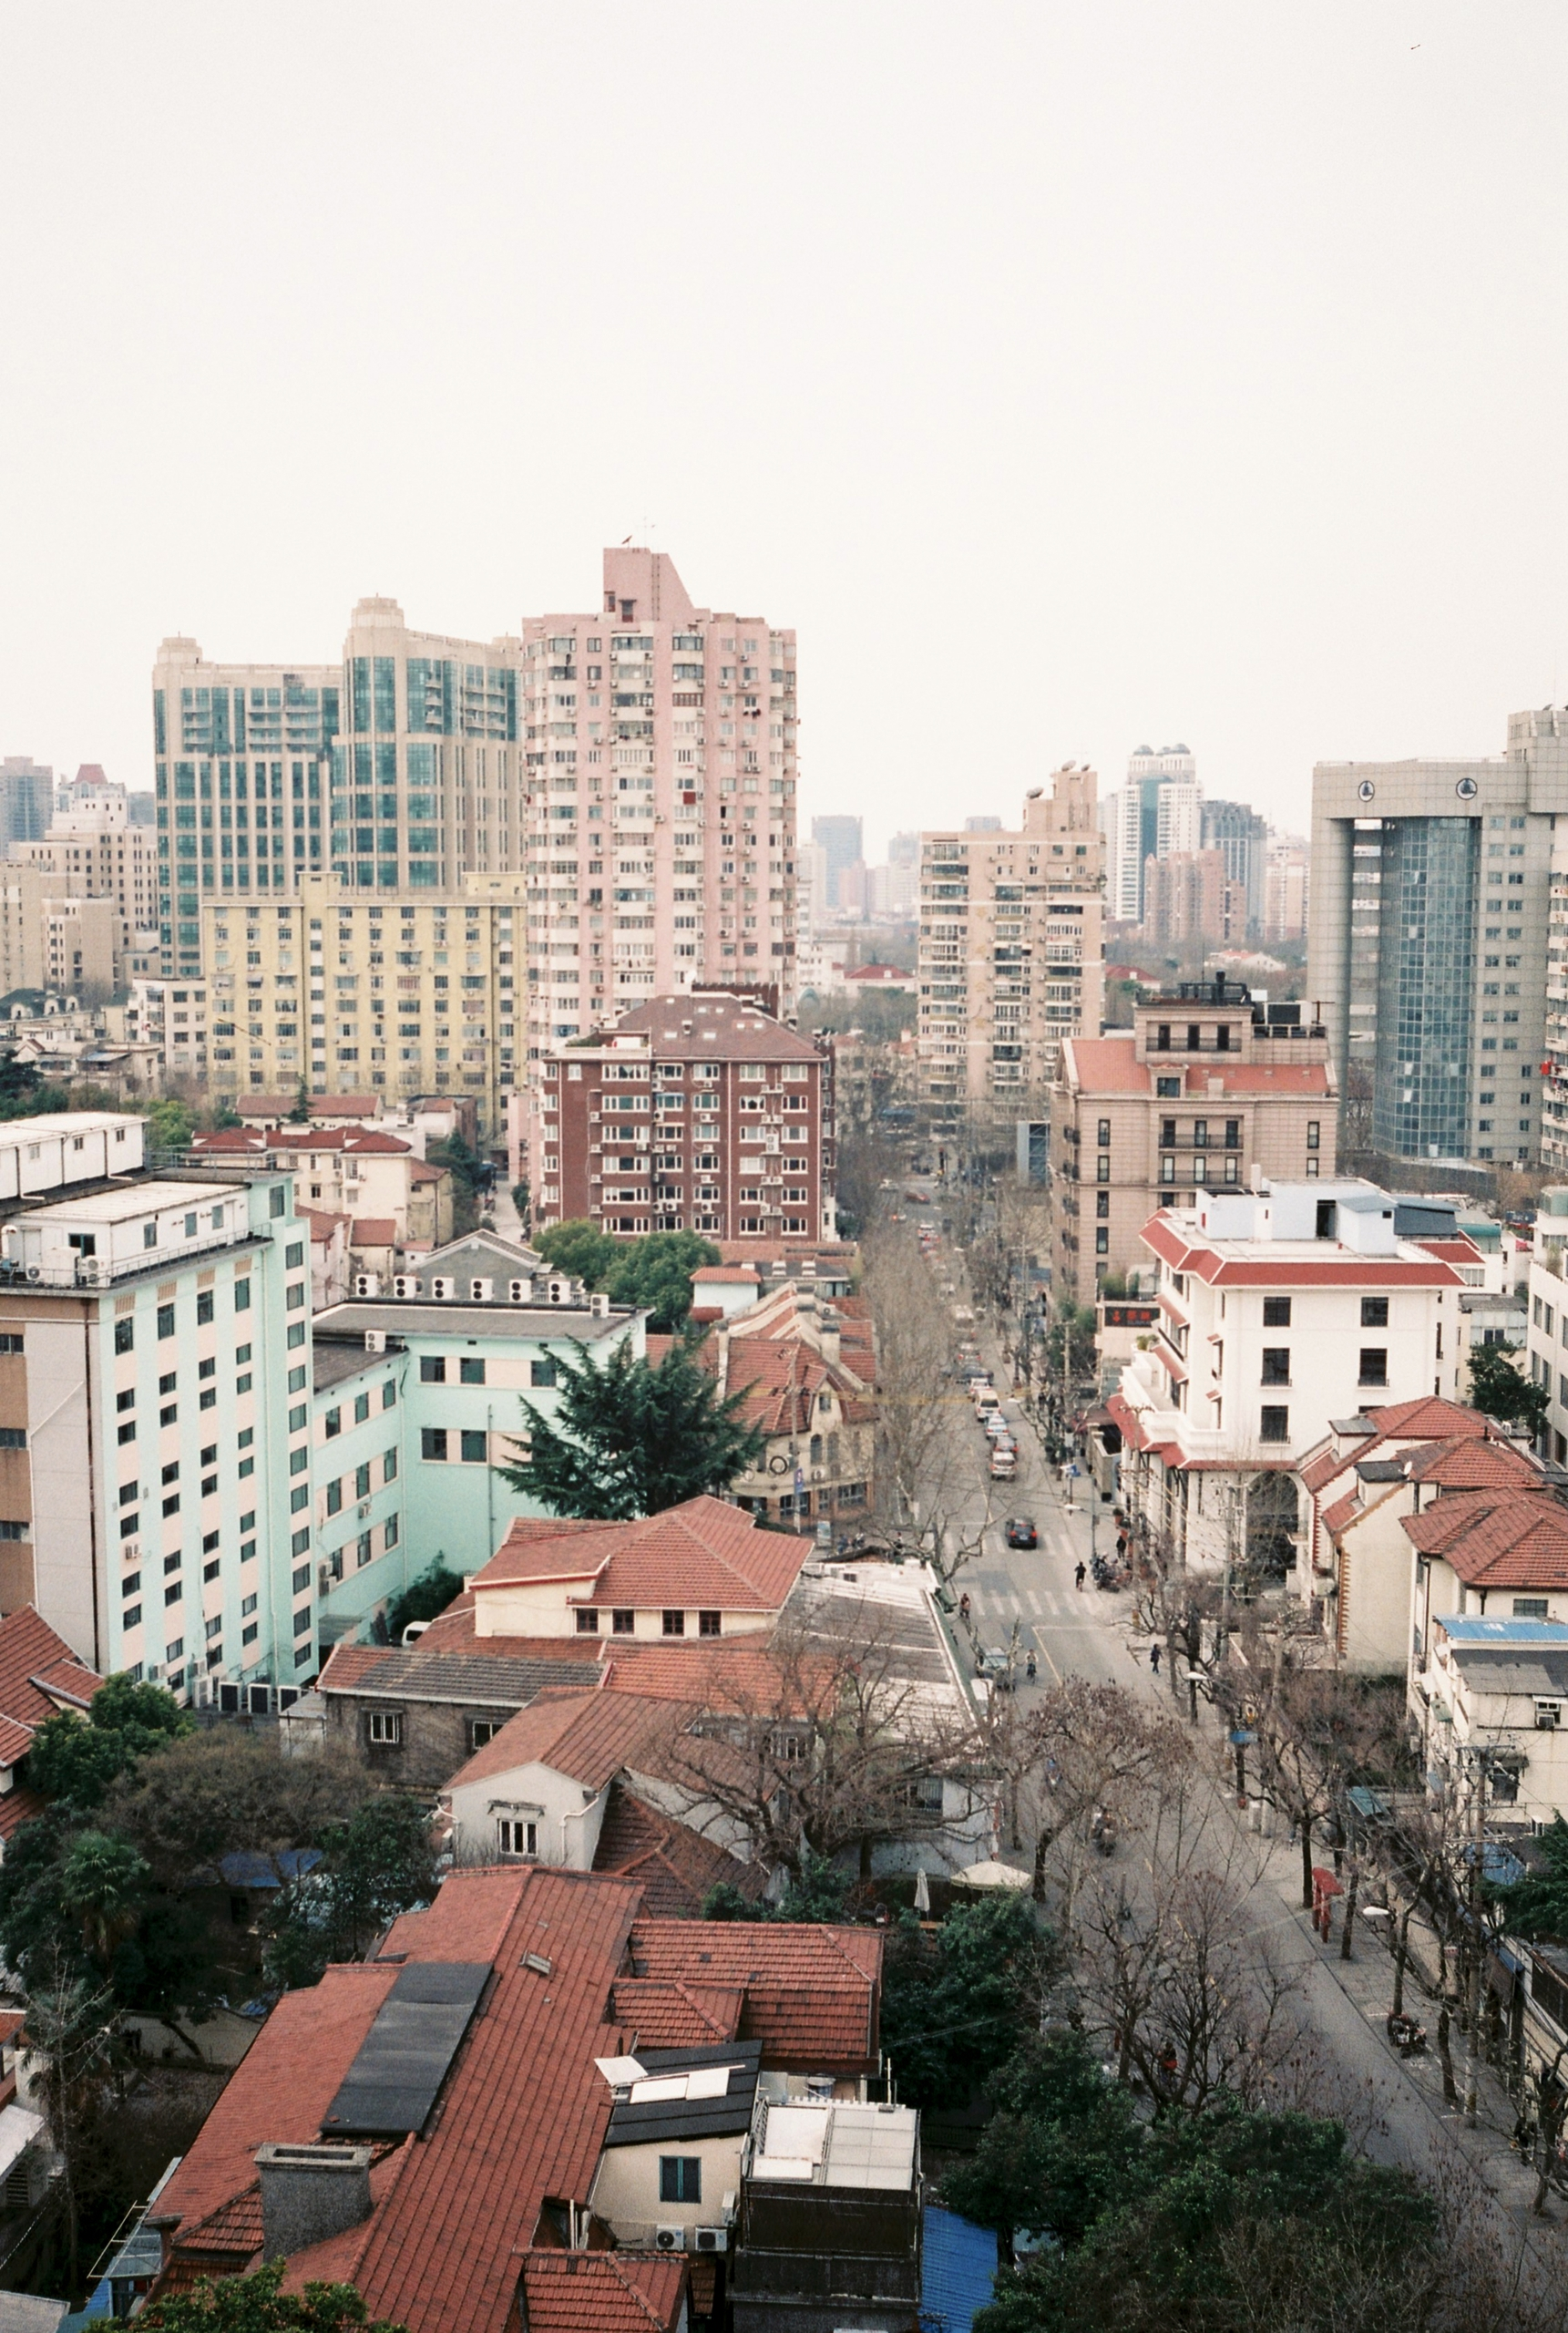 colorful neighborhood | Shangha - klei_ber | ello